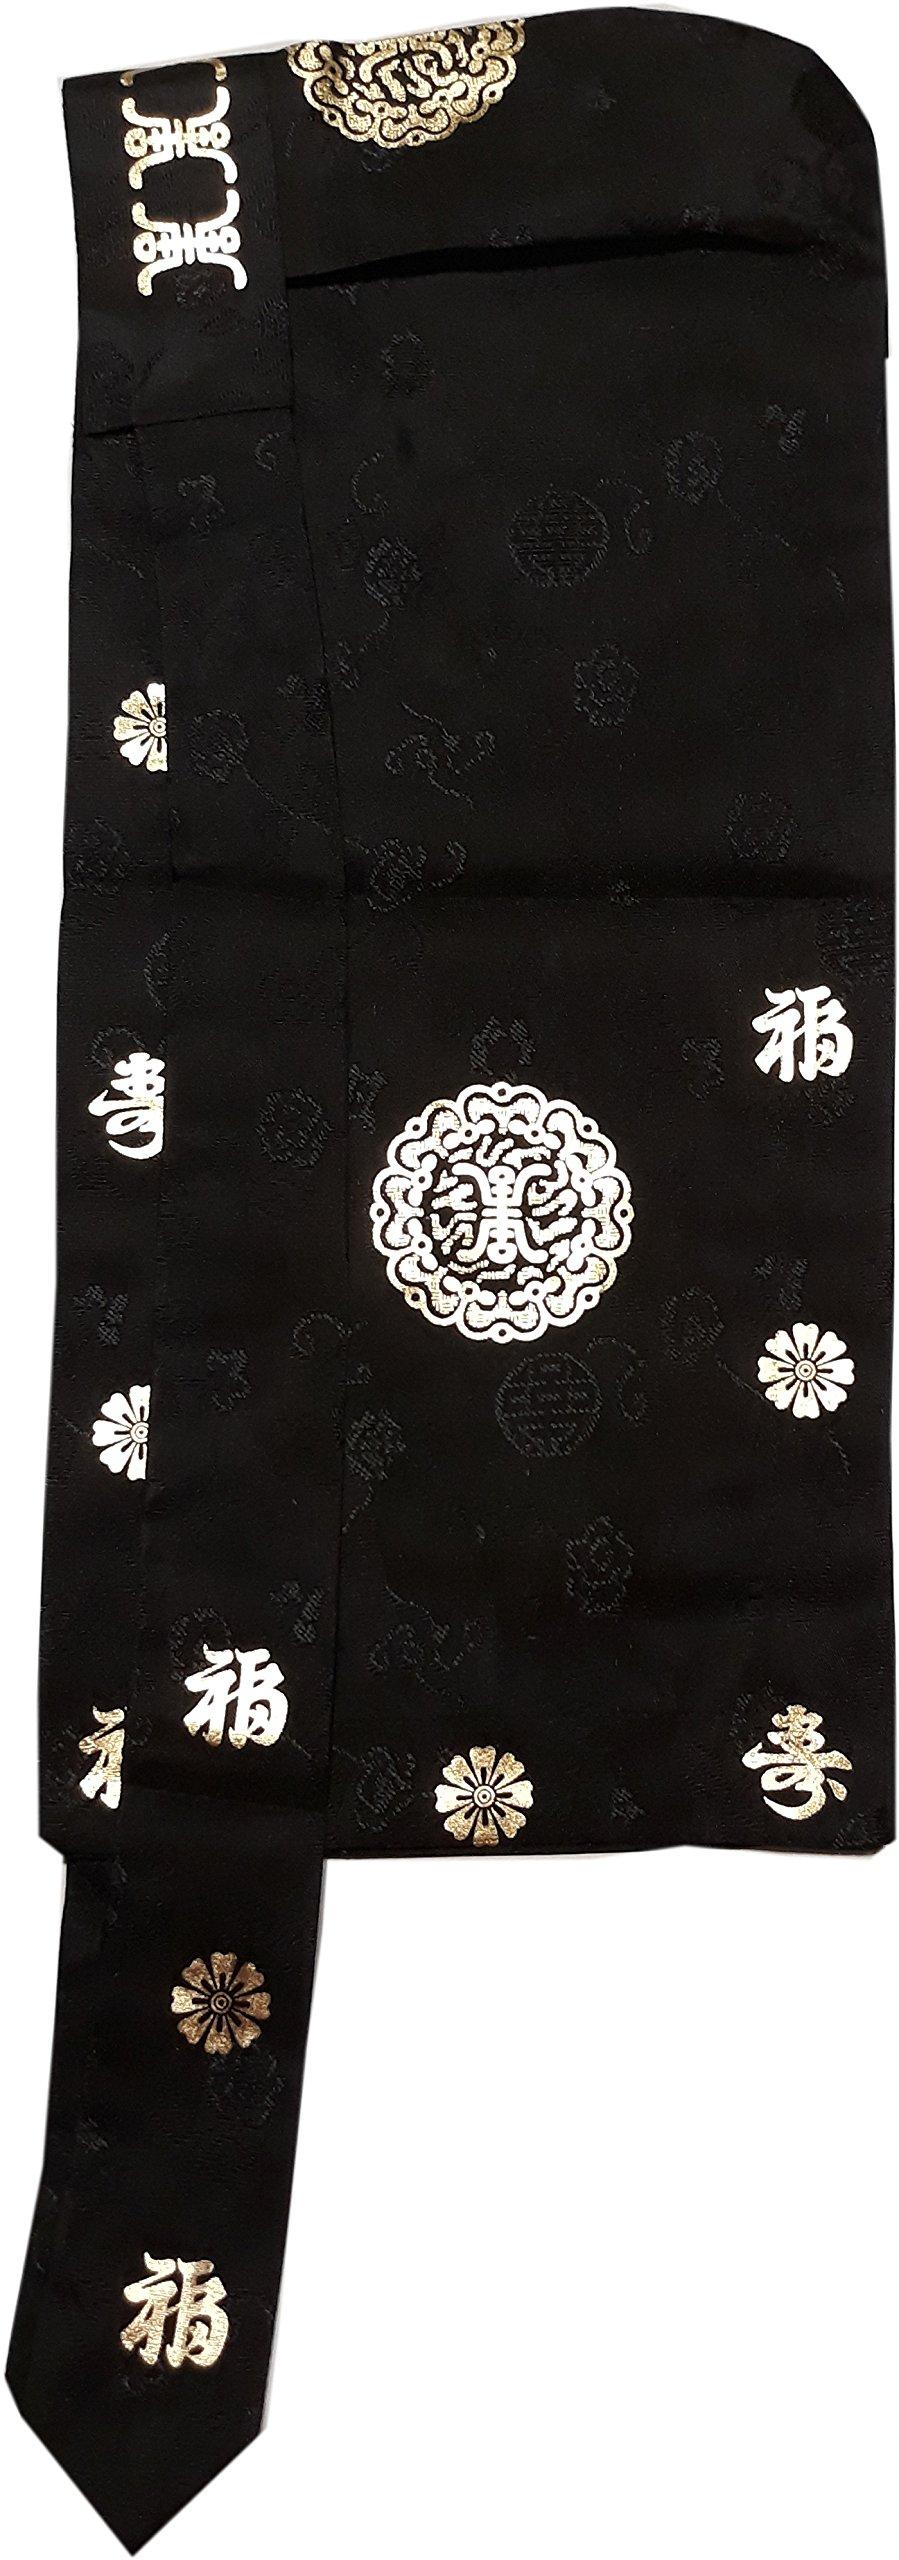 Korean hanboks boys babies cap traditional costumes cap BOKGUN black color gold print (1-2 ages)